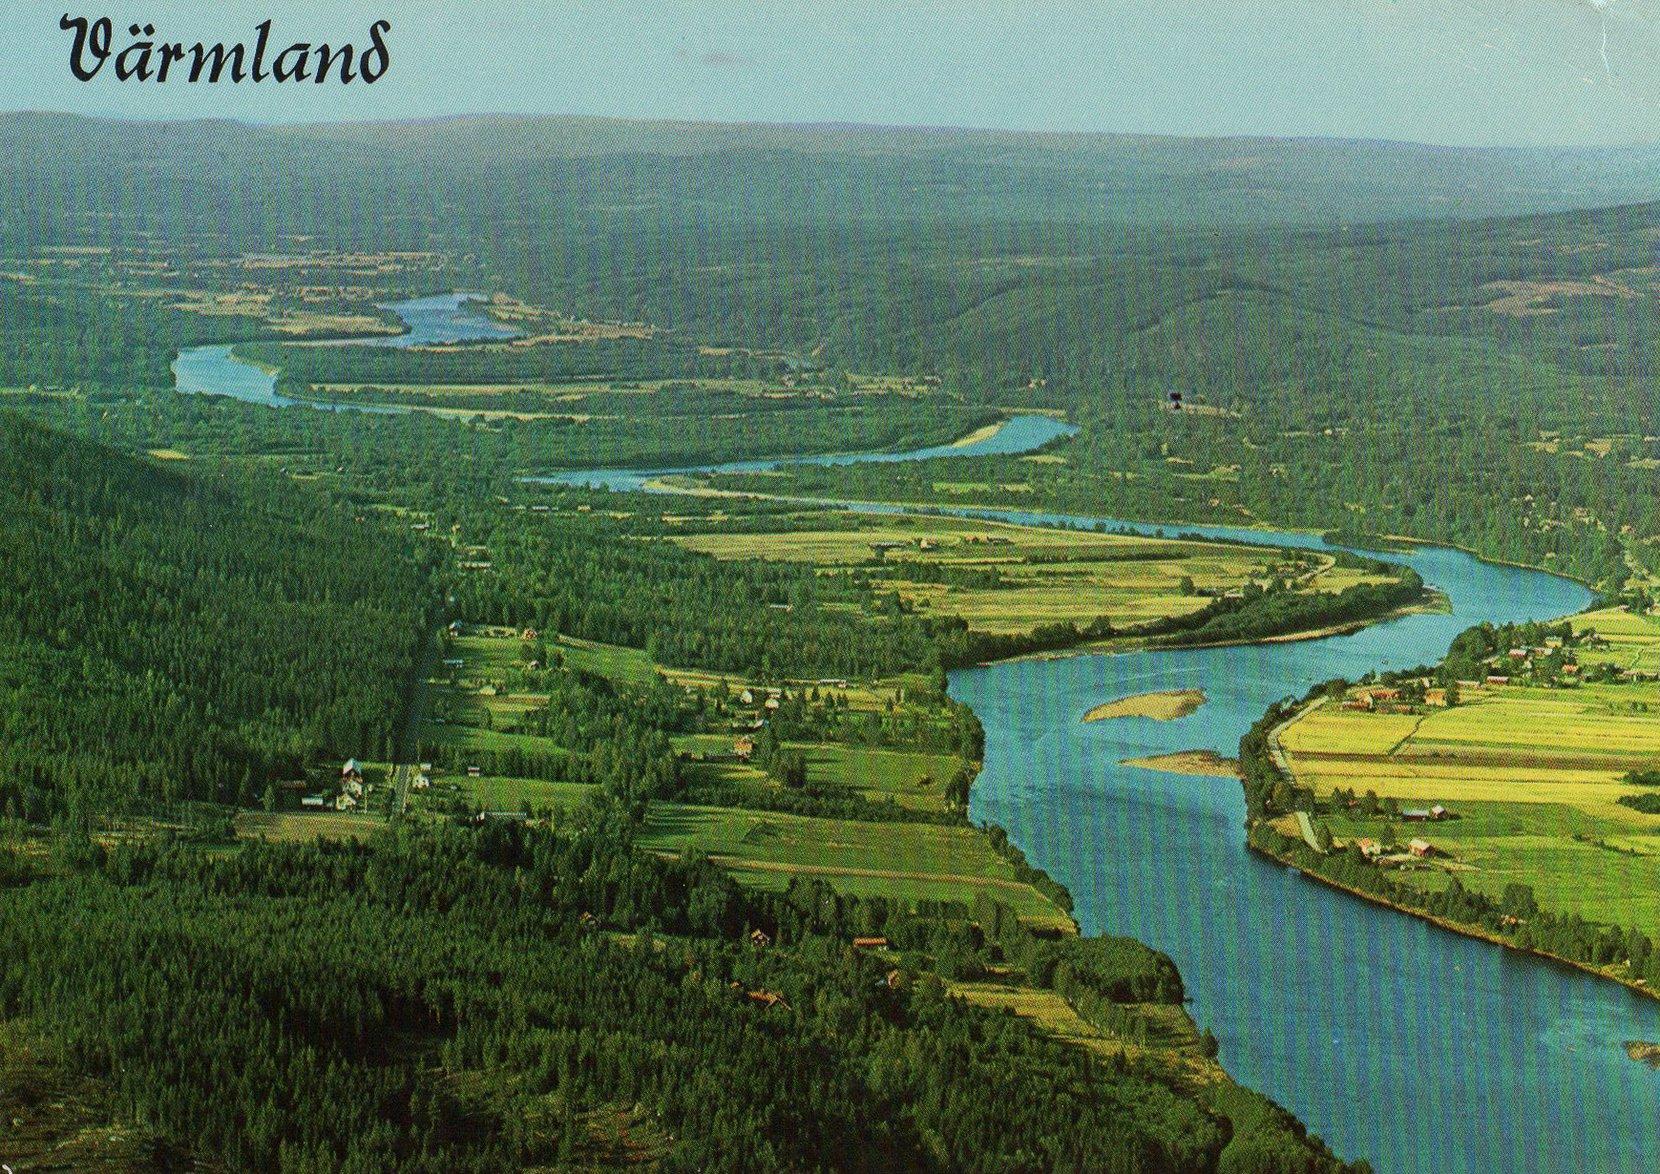 värmland (sweden) postcards standard – printed card